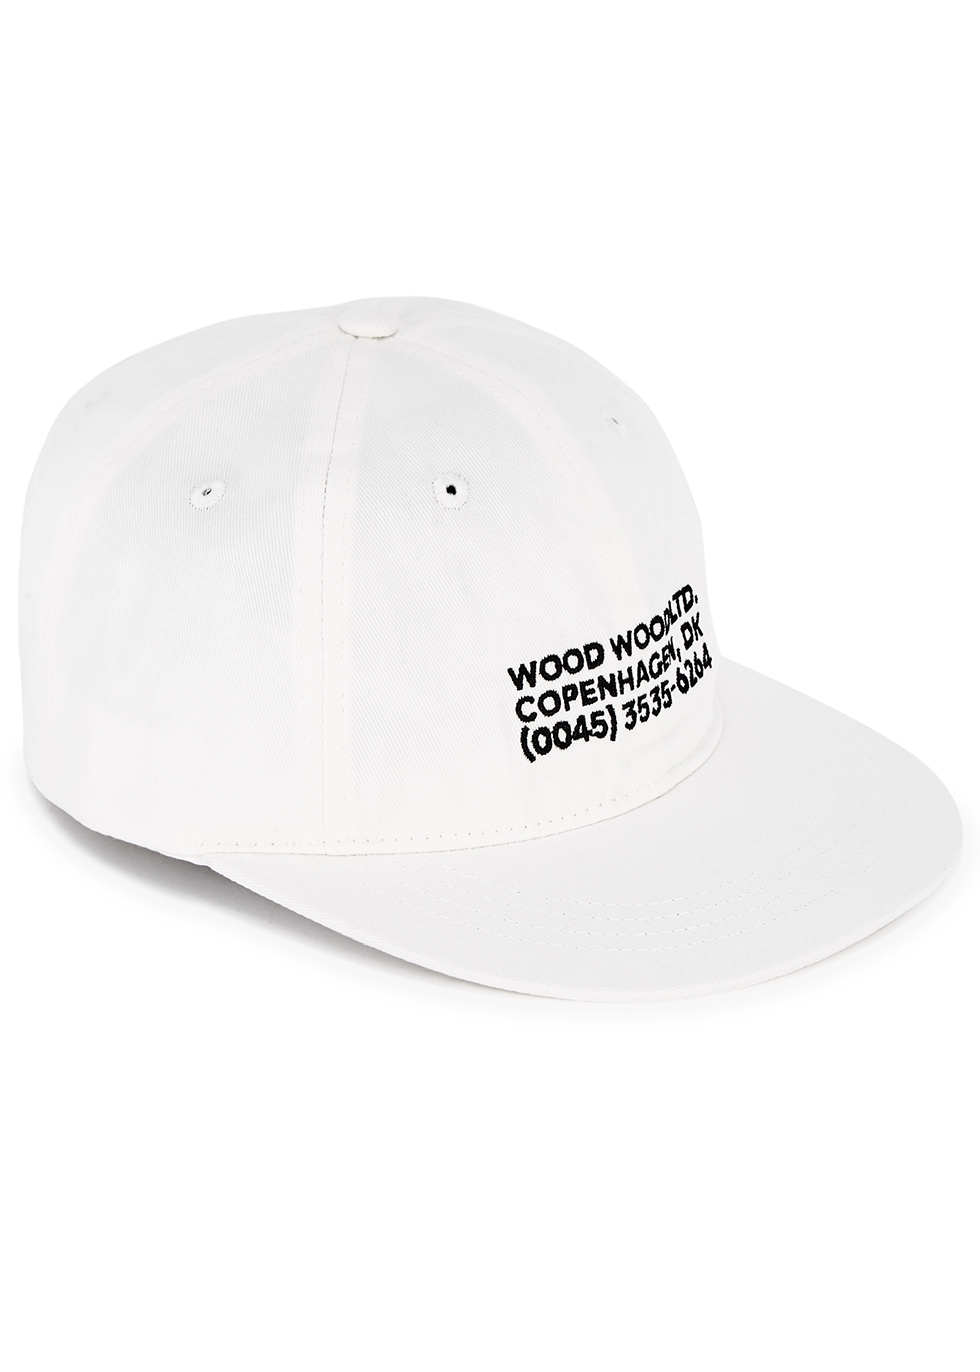 Wood Wood White Logo Embroidered Cotton Cap Harvey Nichols